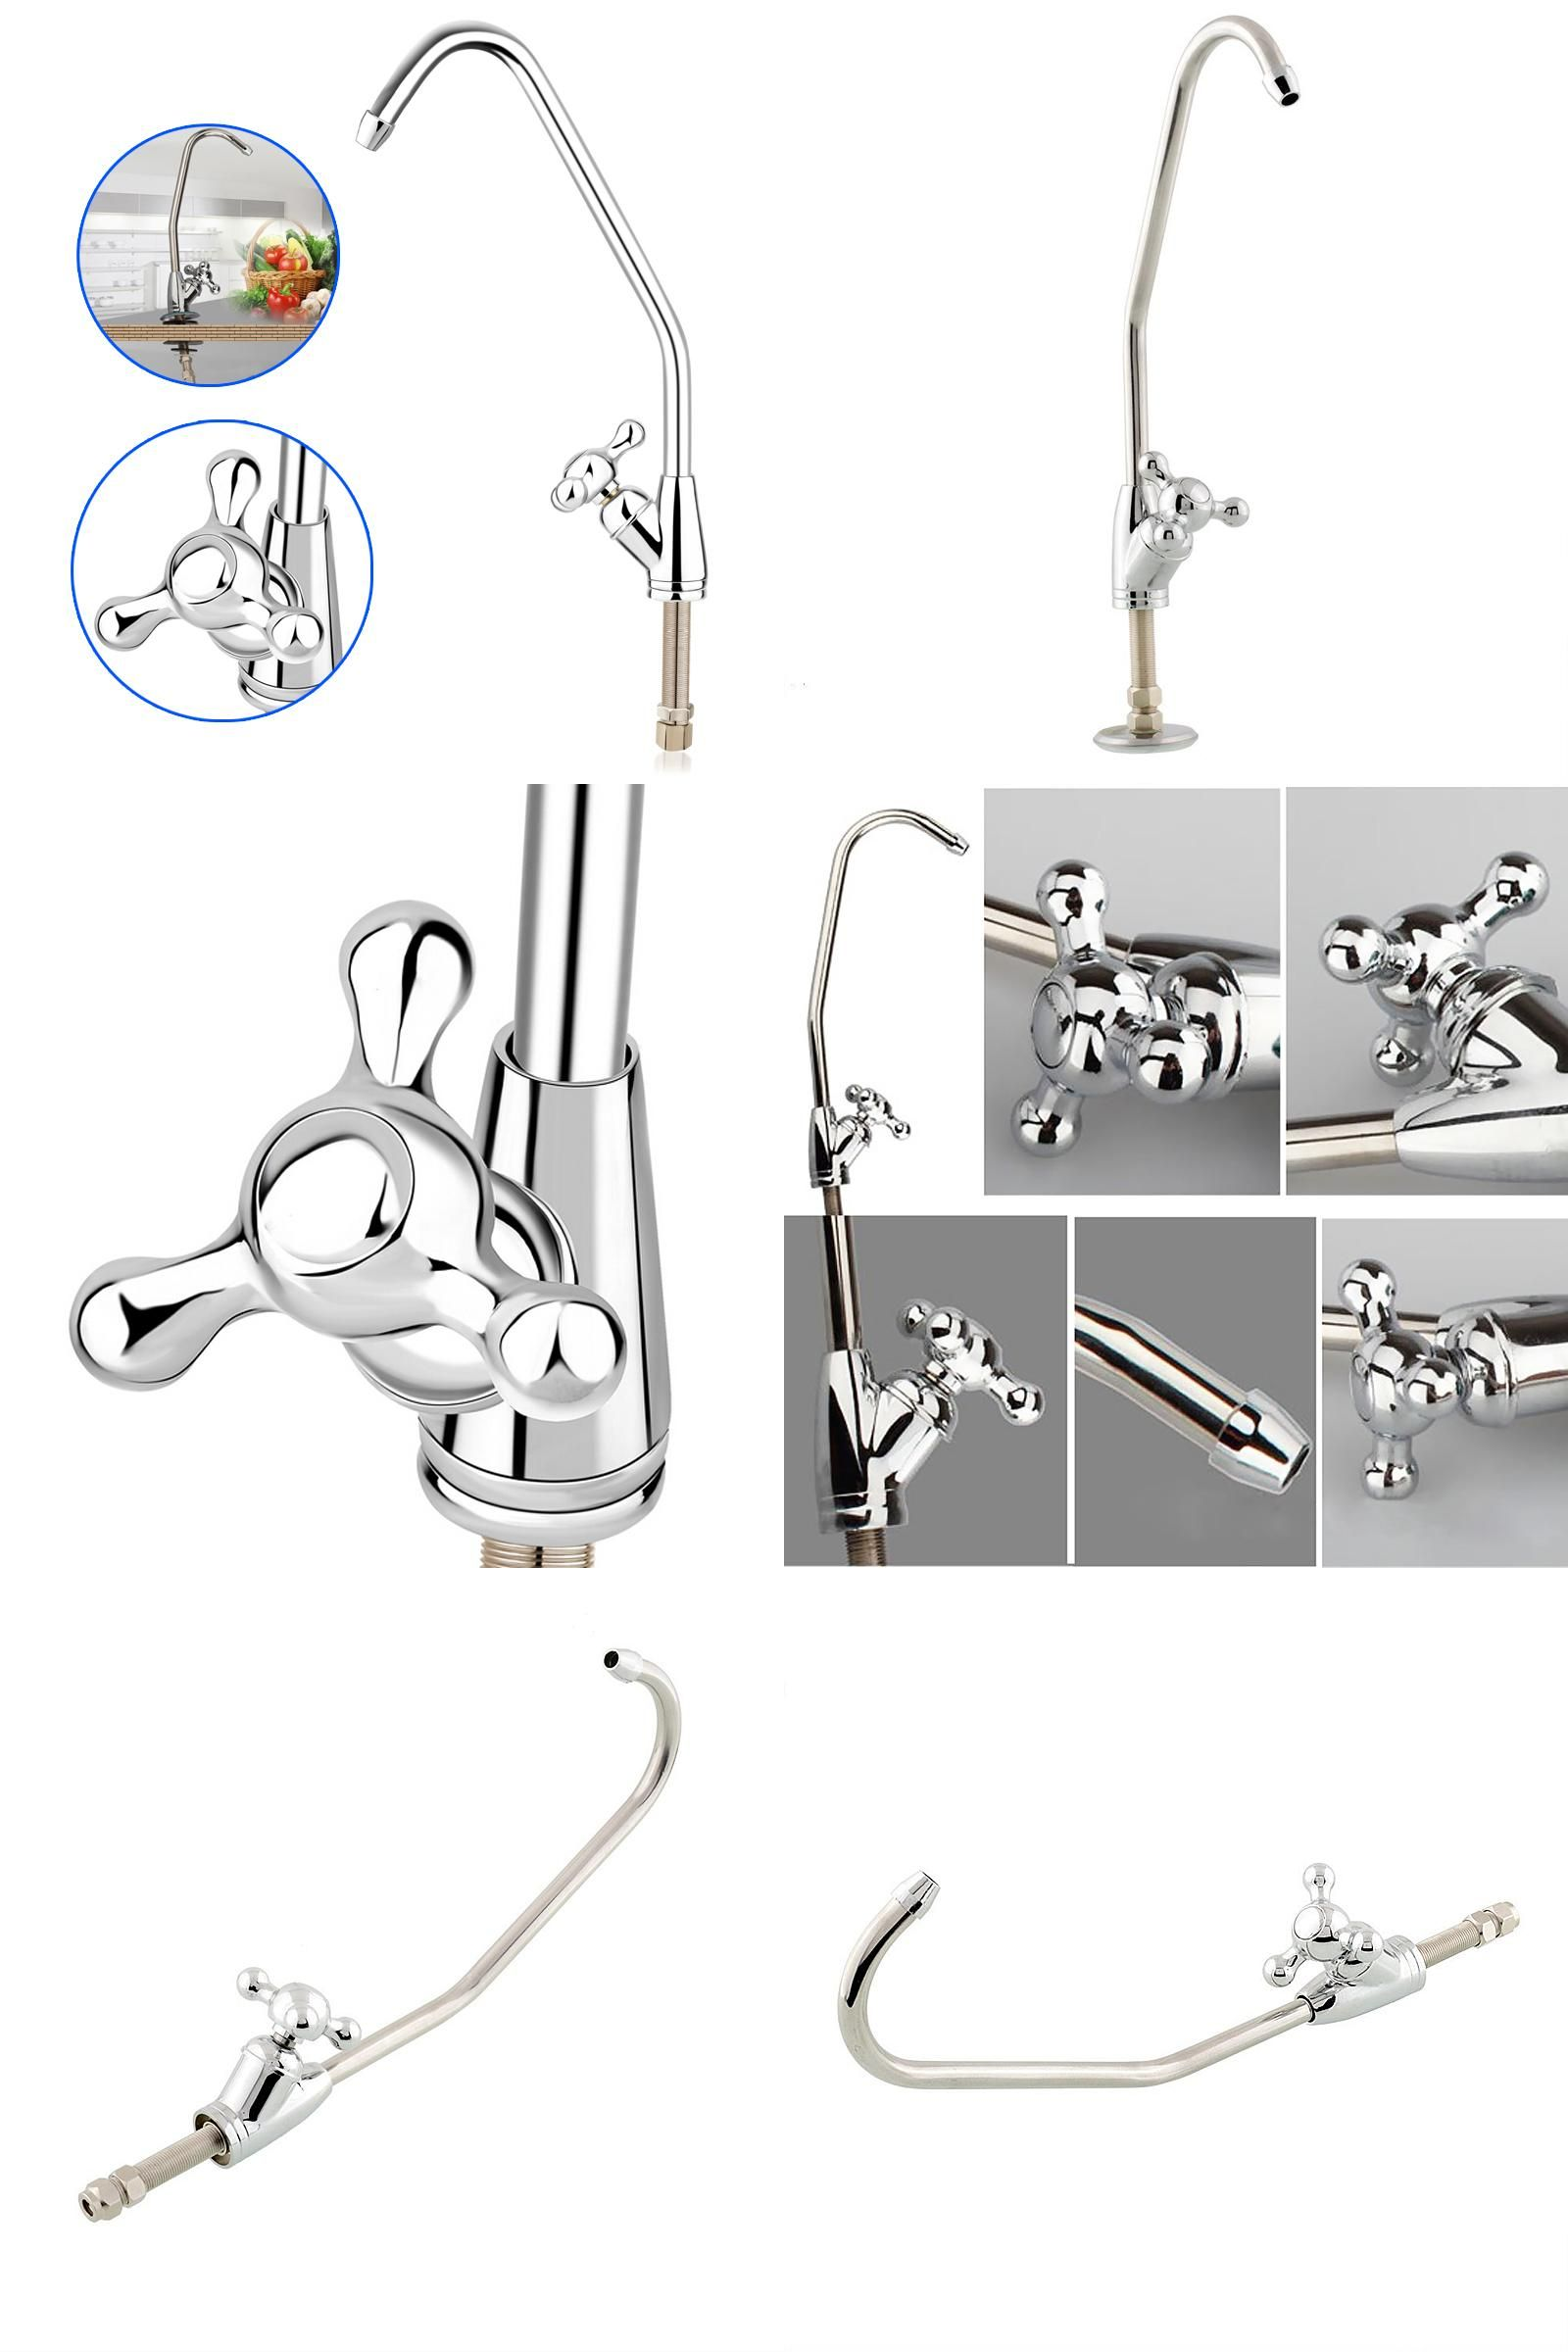 Visit to Buy] Reverse Osmosis Water Filter Sink Faucet Tap Brushed ...